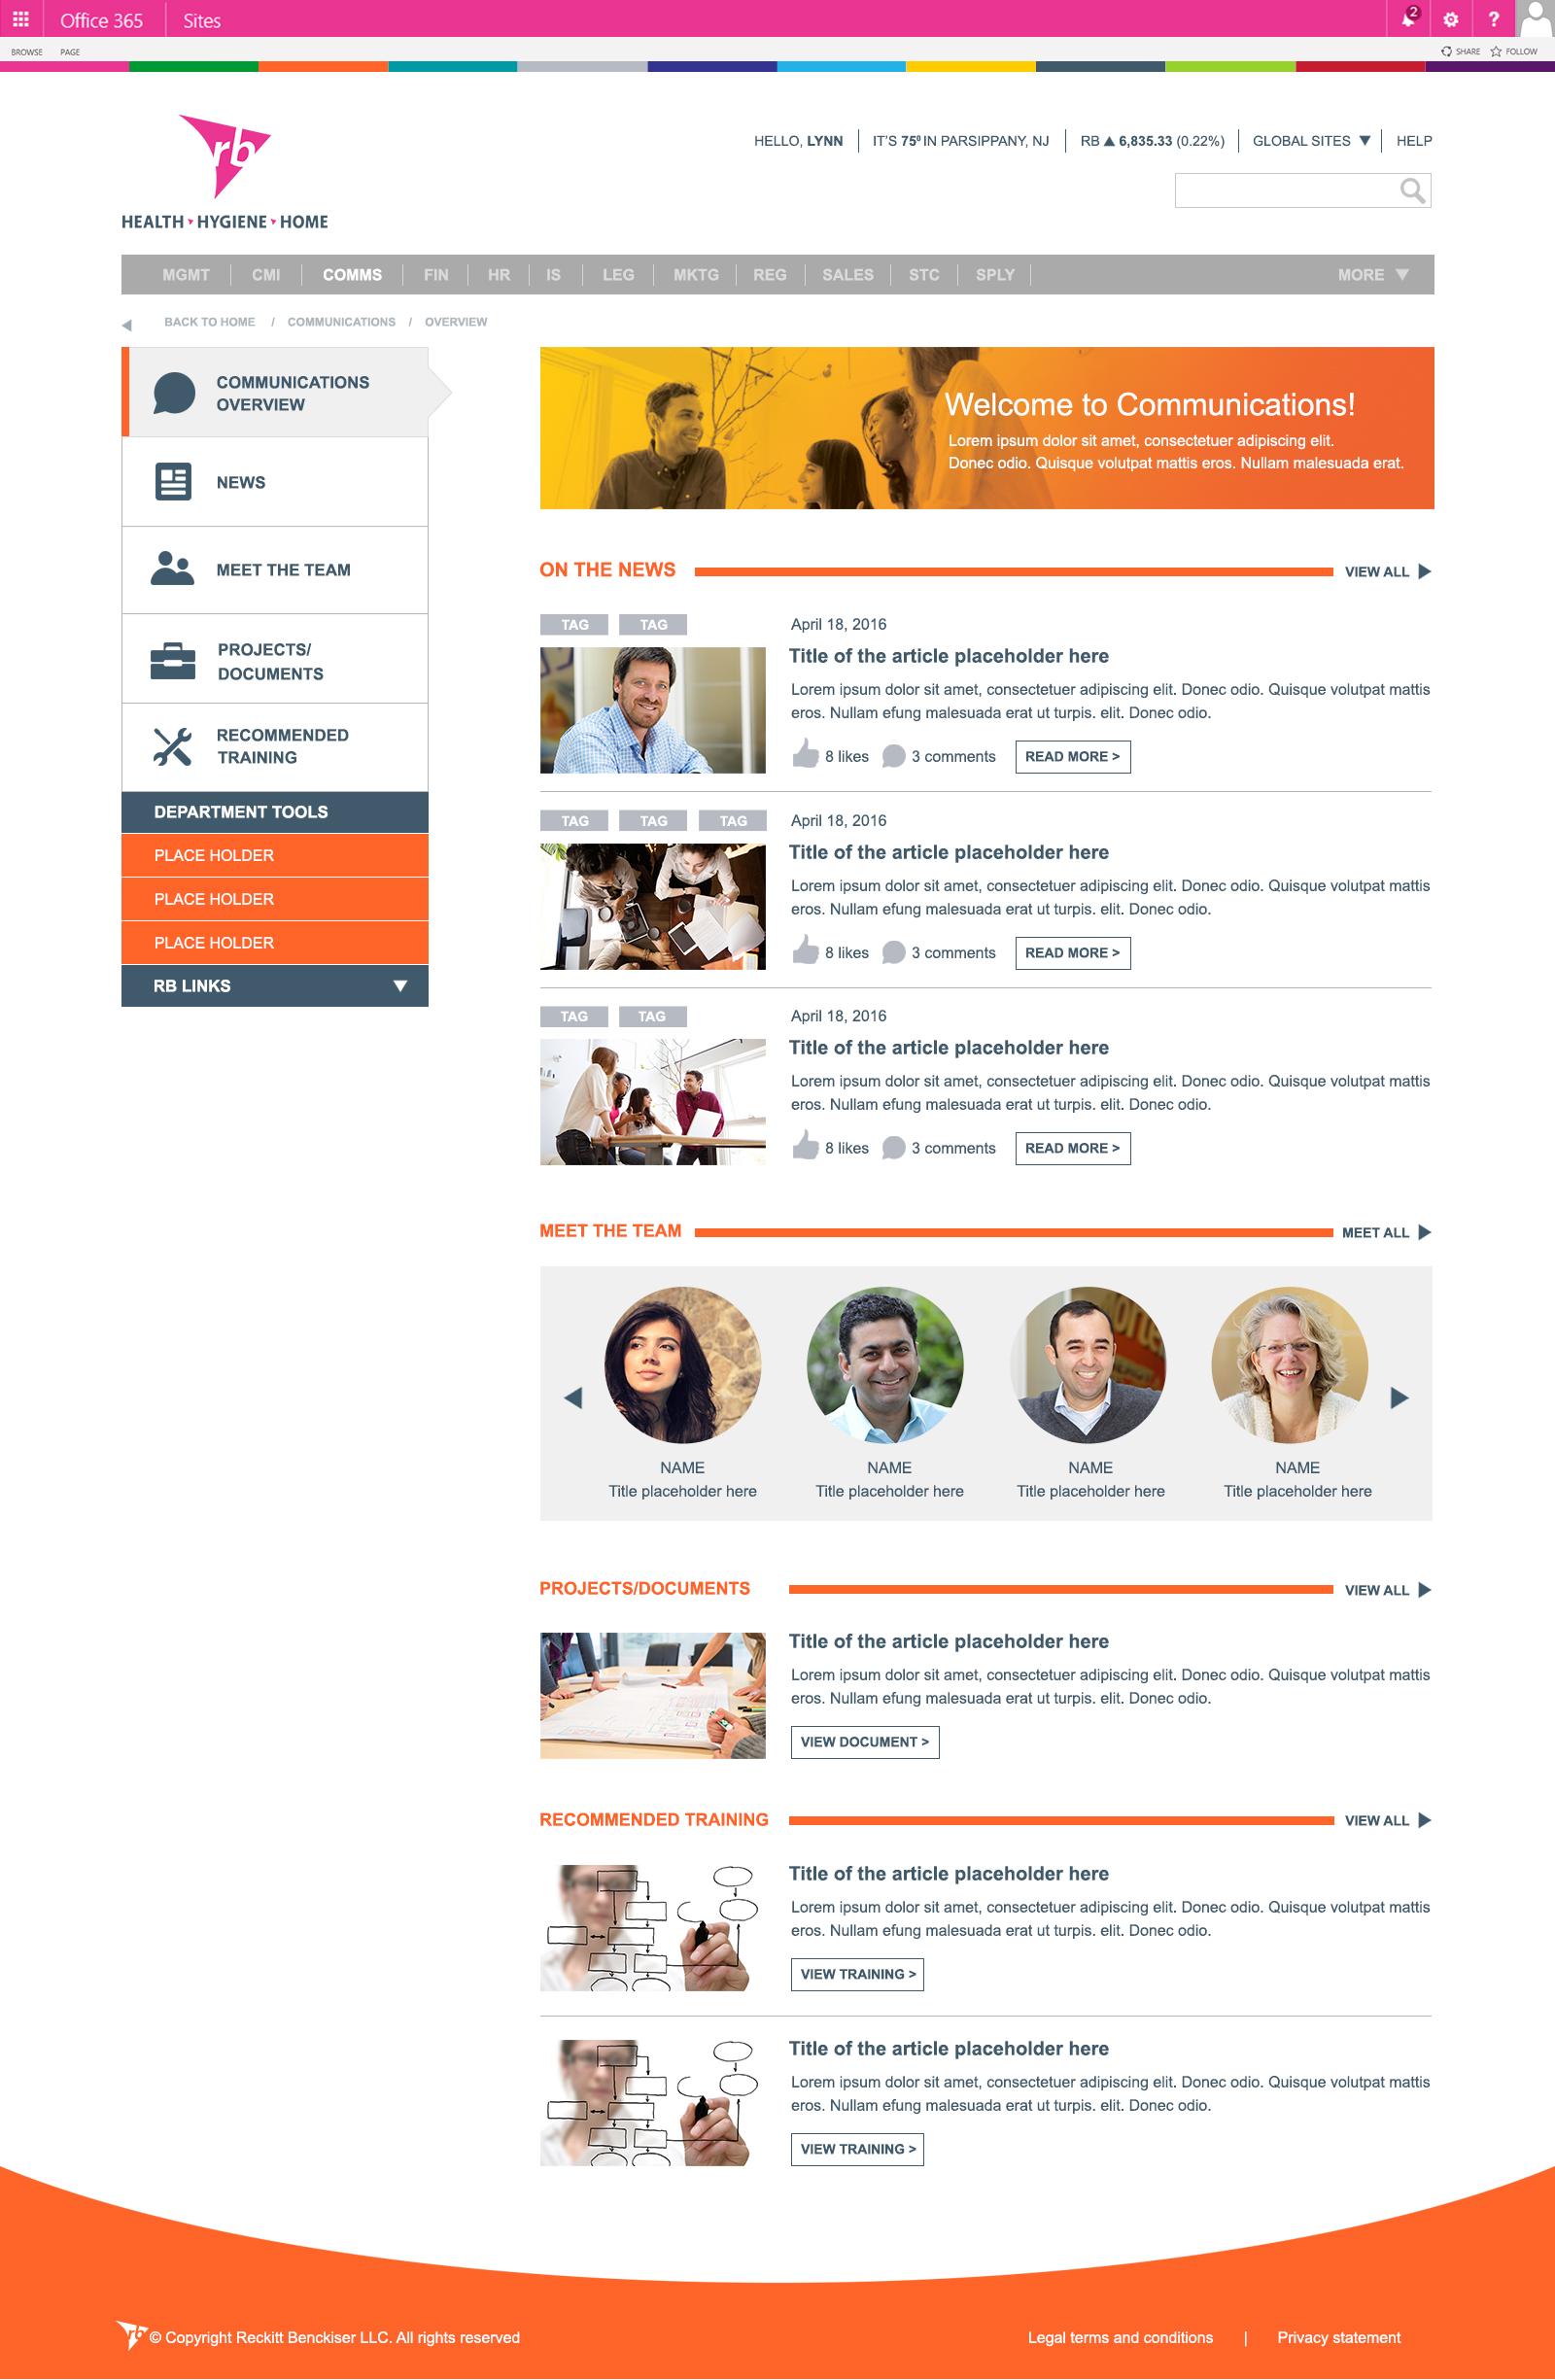 Desktop_RB_Sharepoint_Communications_Overview.jpg